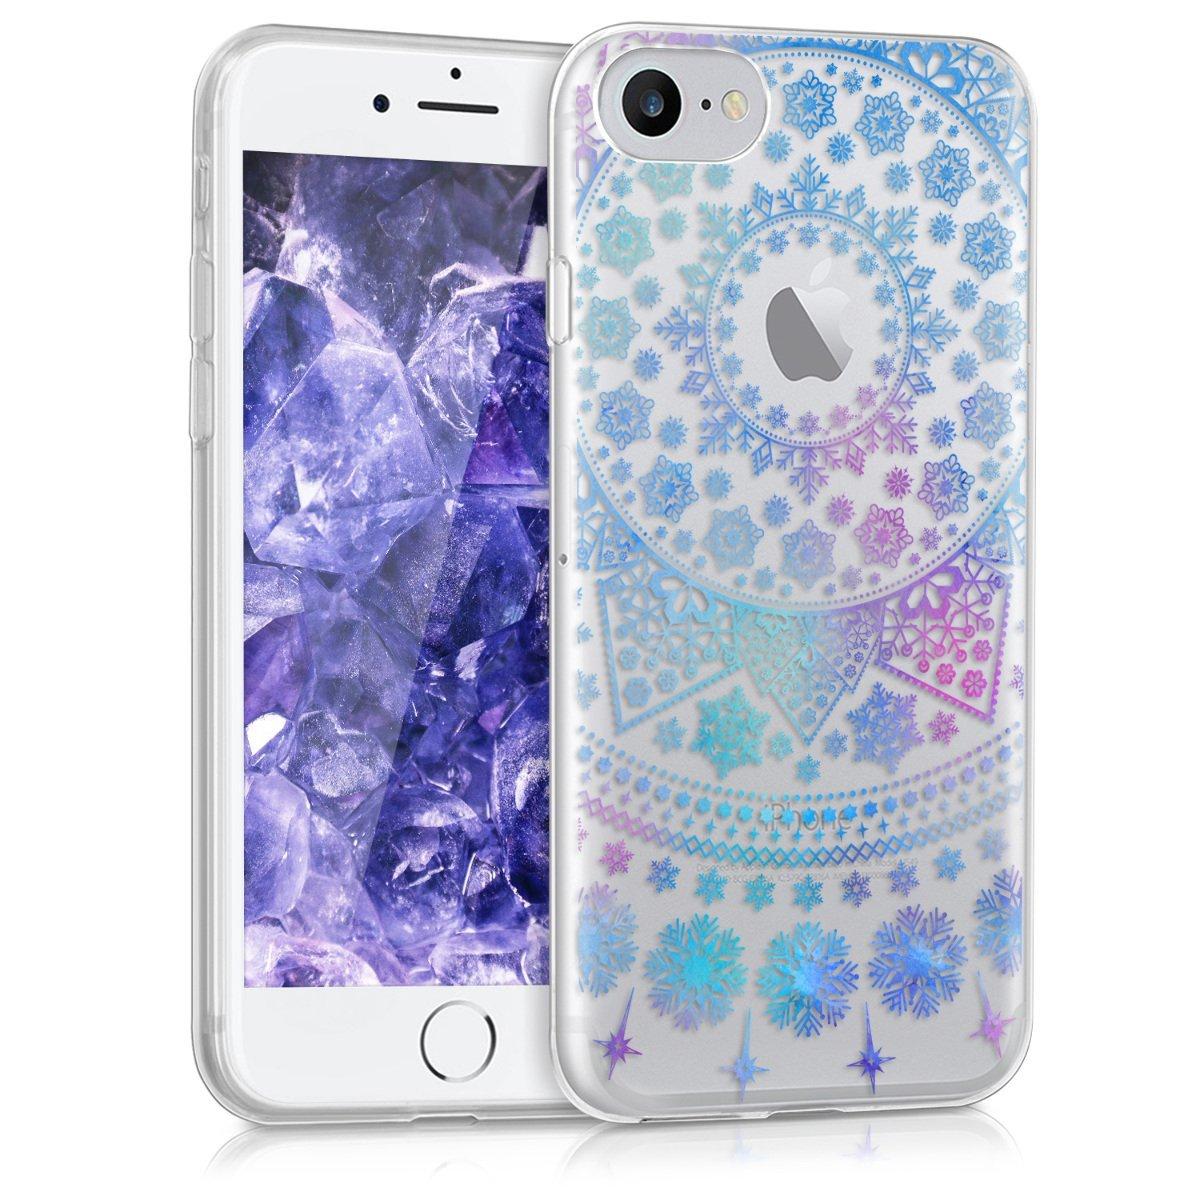 KW Θήκη Σιλικόνης iPhone 7 - Snowflakes Blue/ Dark Pink (39466.23)